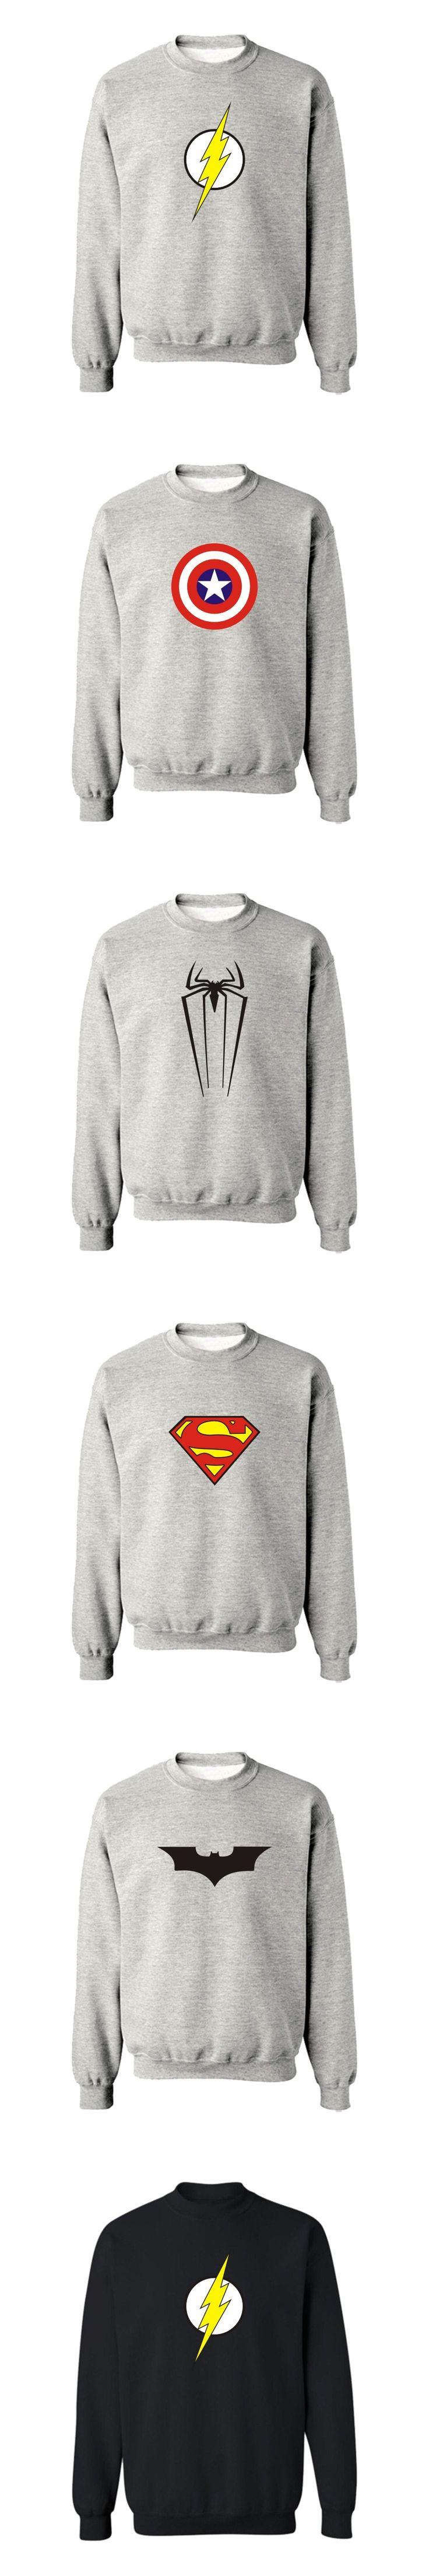 Hot !! Superman Logo 4XL Harajuku Sweatshirt  in Batman Super Man Mens Hoodies and Sweatshirts Hip Hop Boys Couples